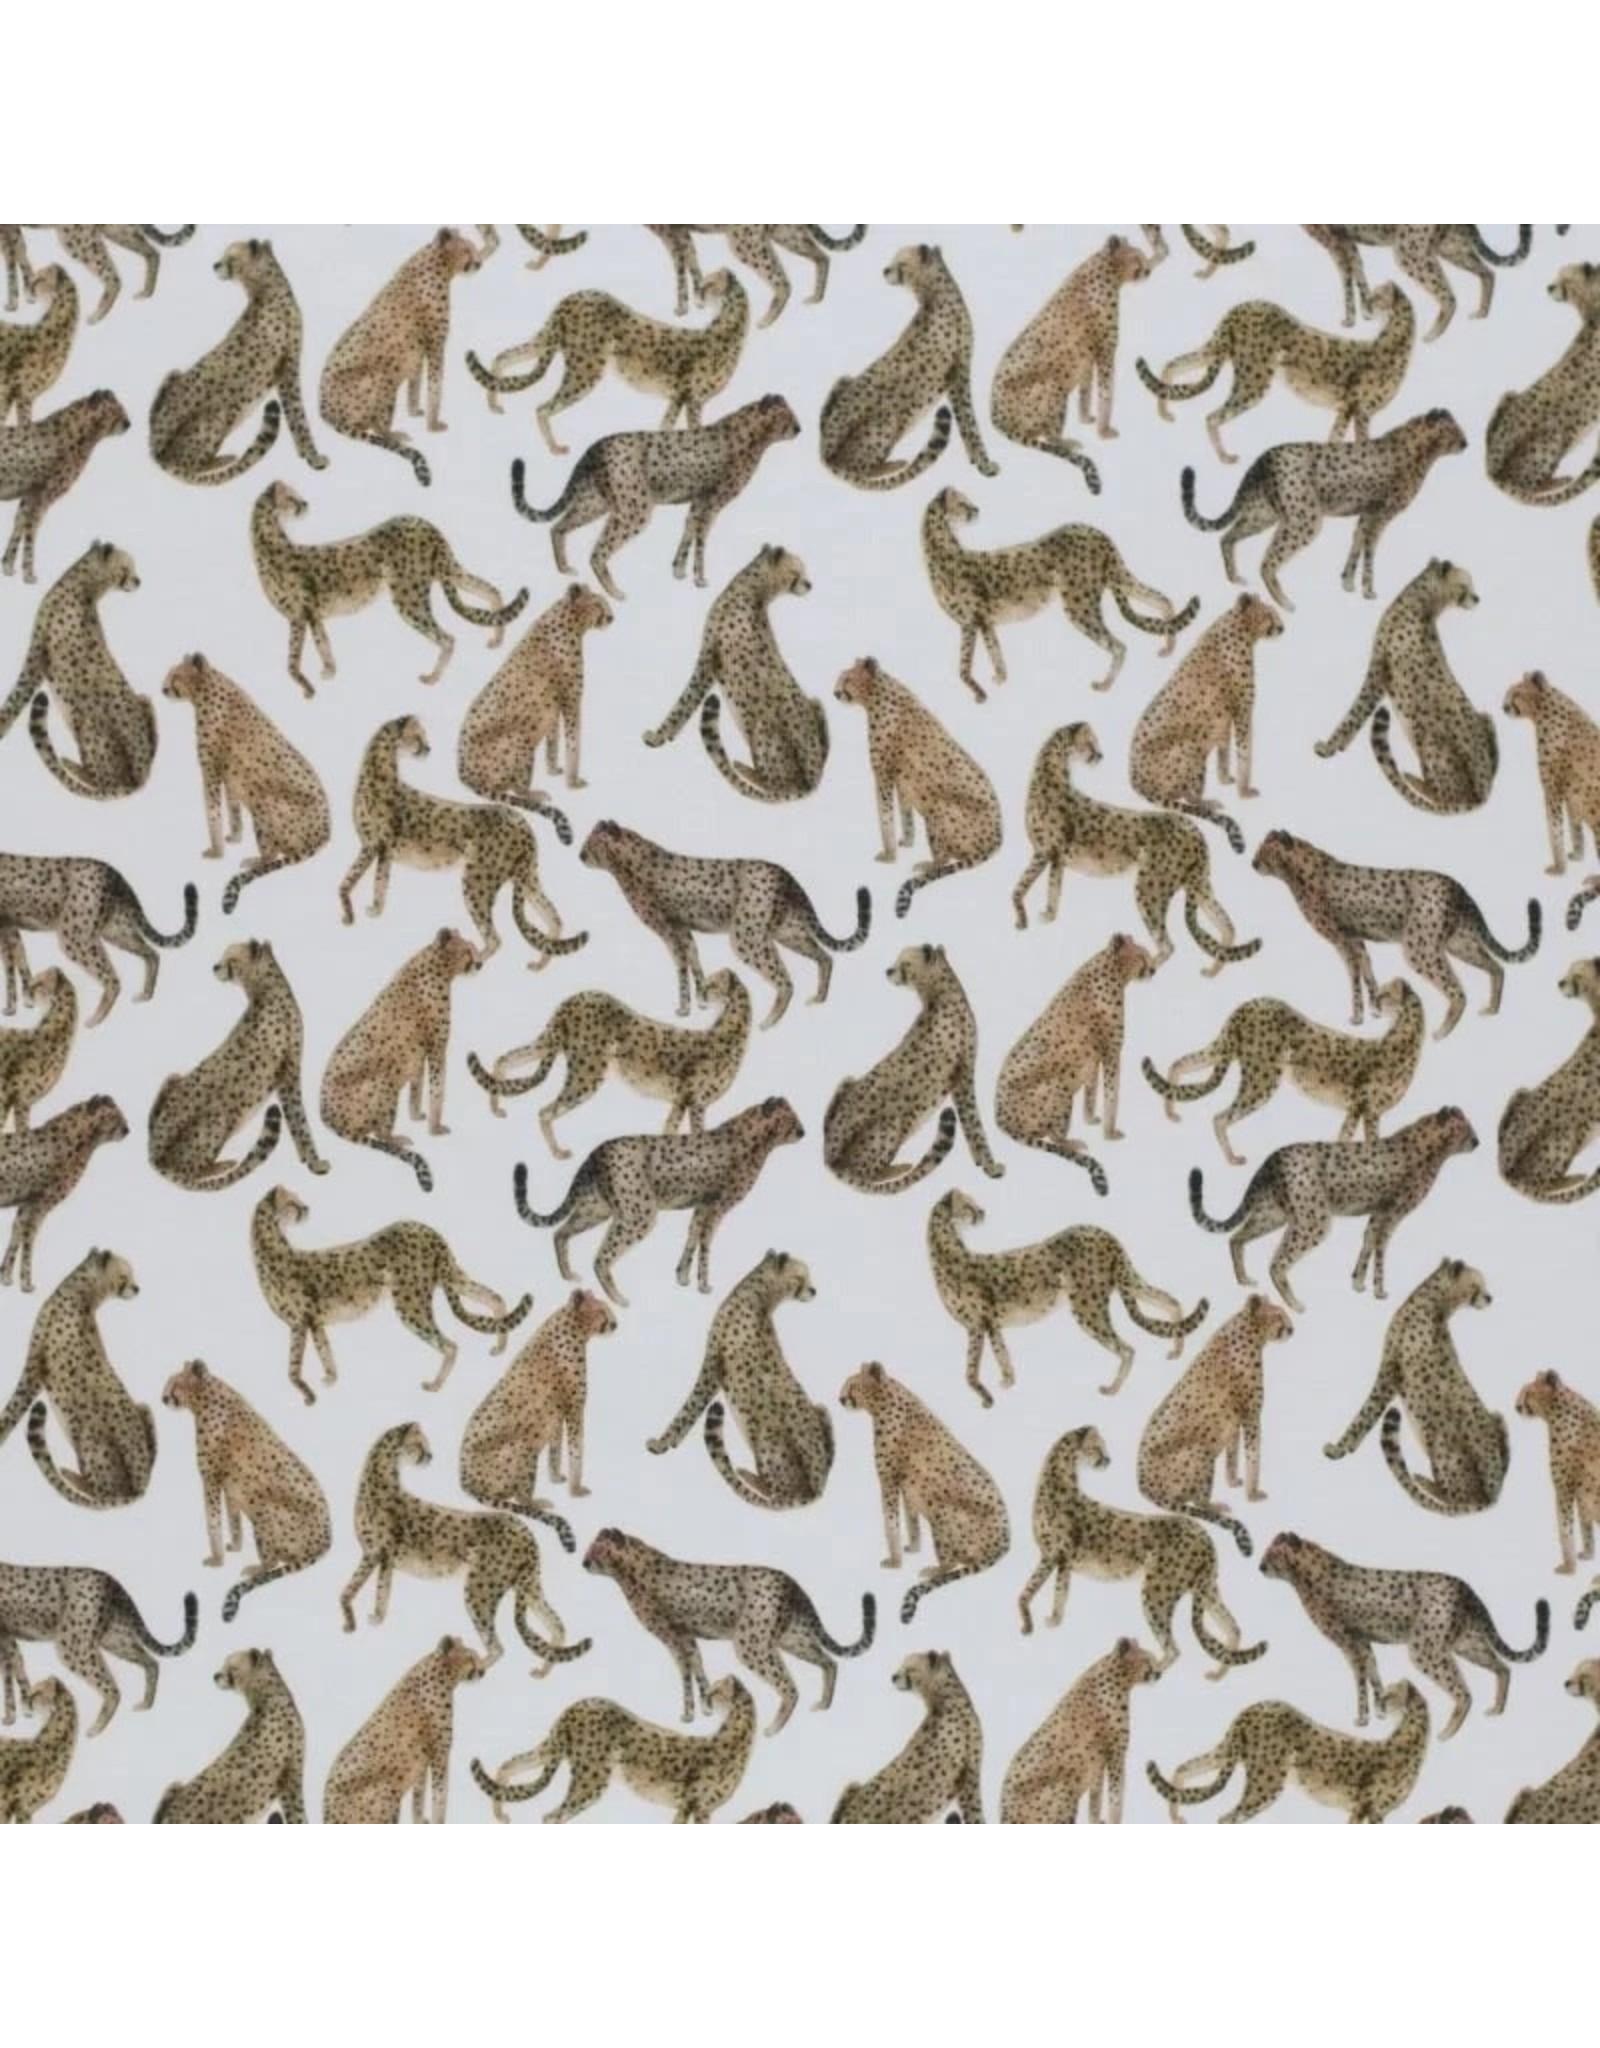 Stik-Stof Jachtluipaard kudde jersey digitale print